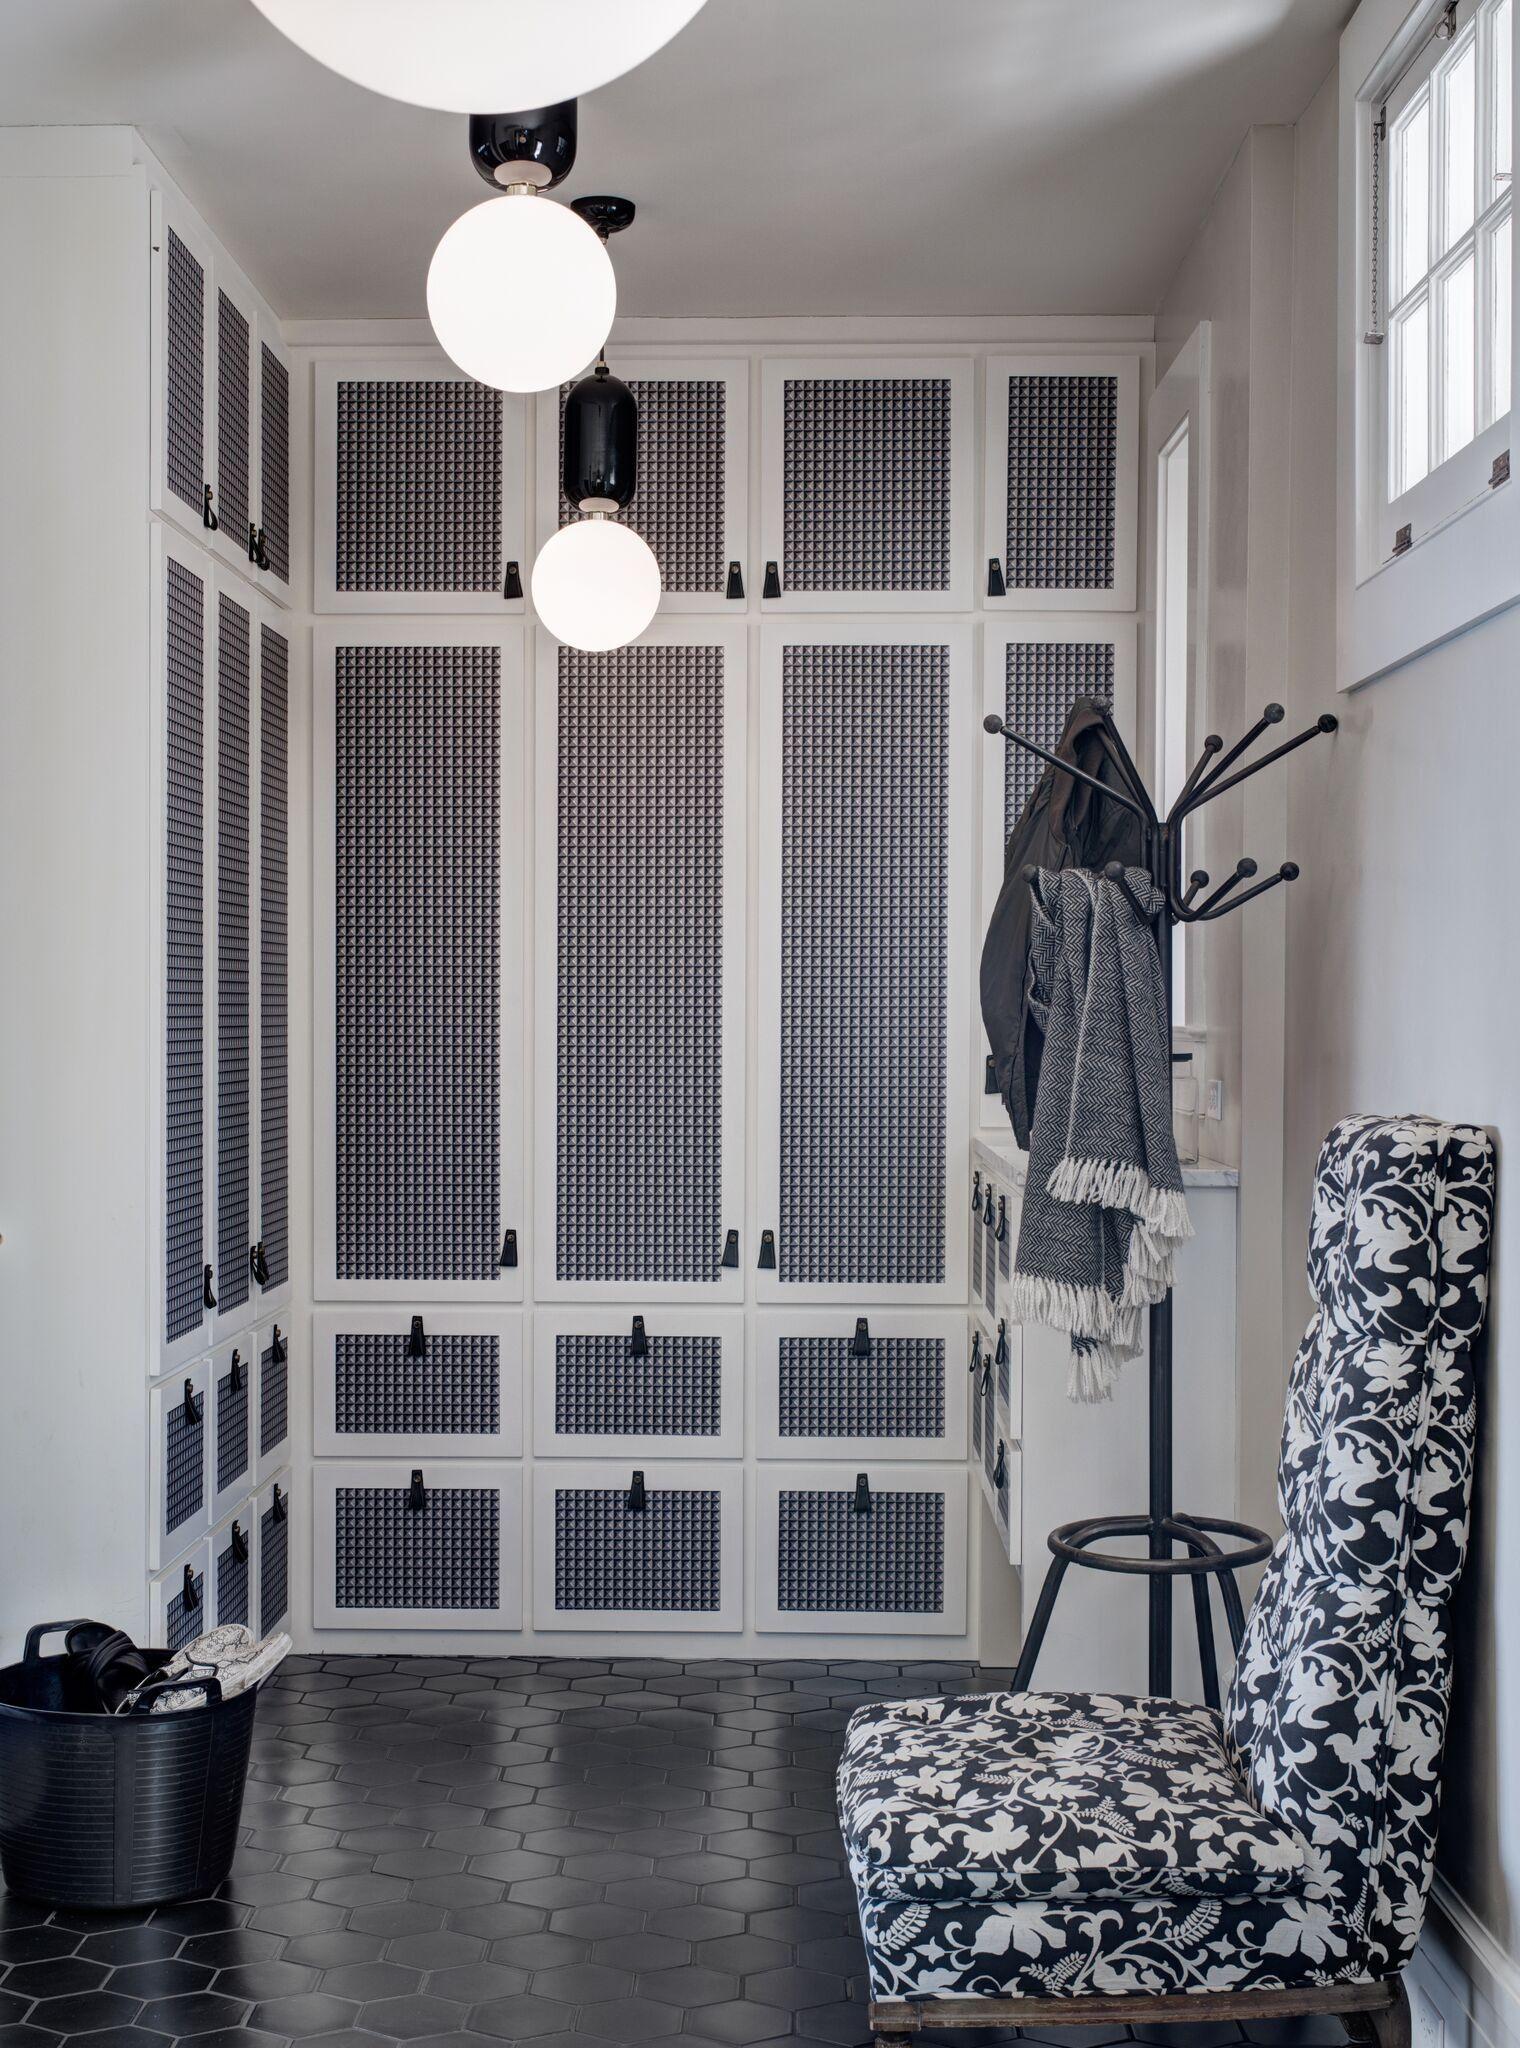 Mudroom, Black Tile Floor, Plaster Walls, Hermes Wallpaper, Leather Pulls